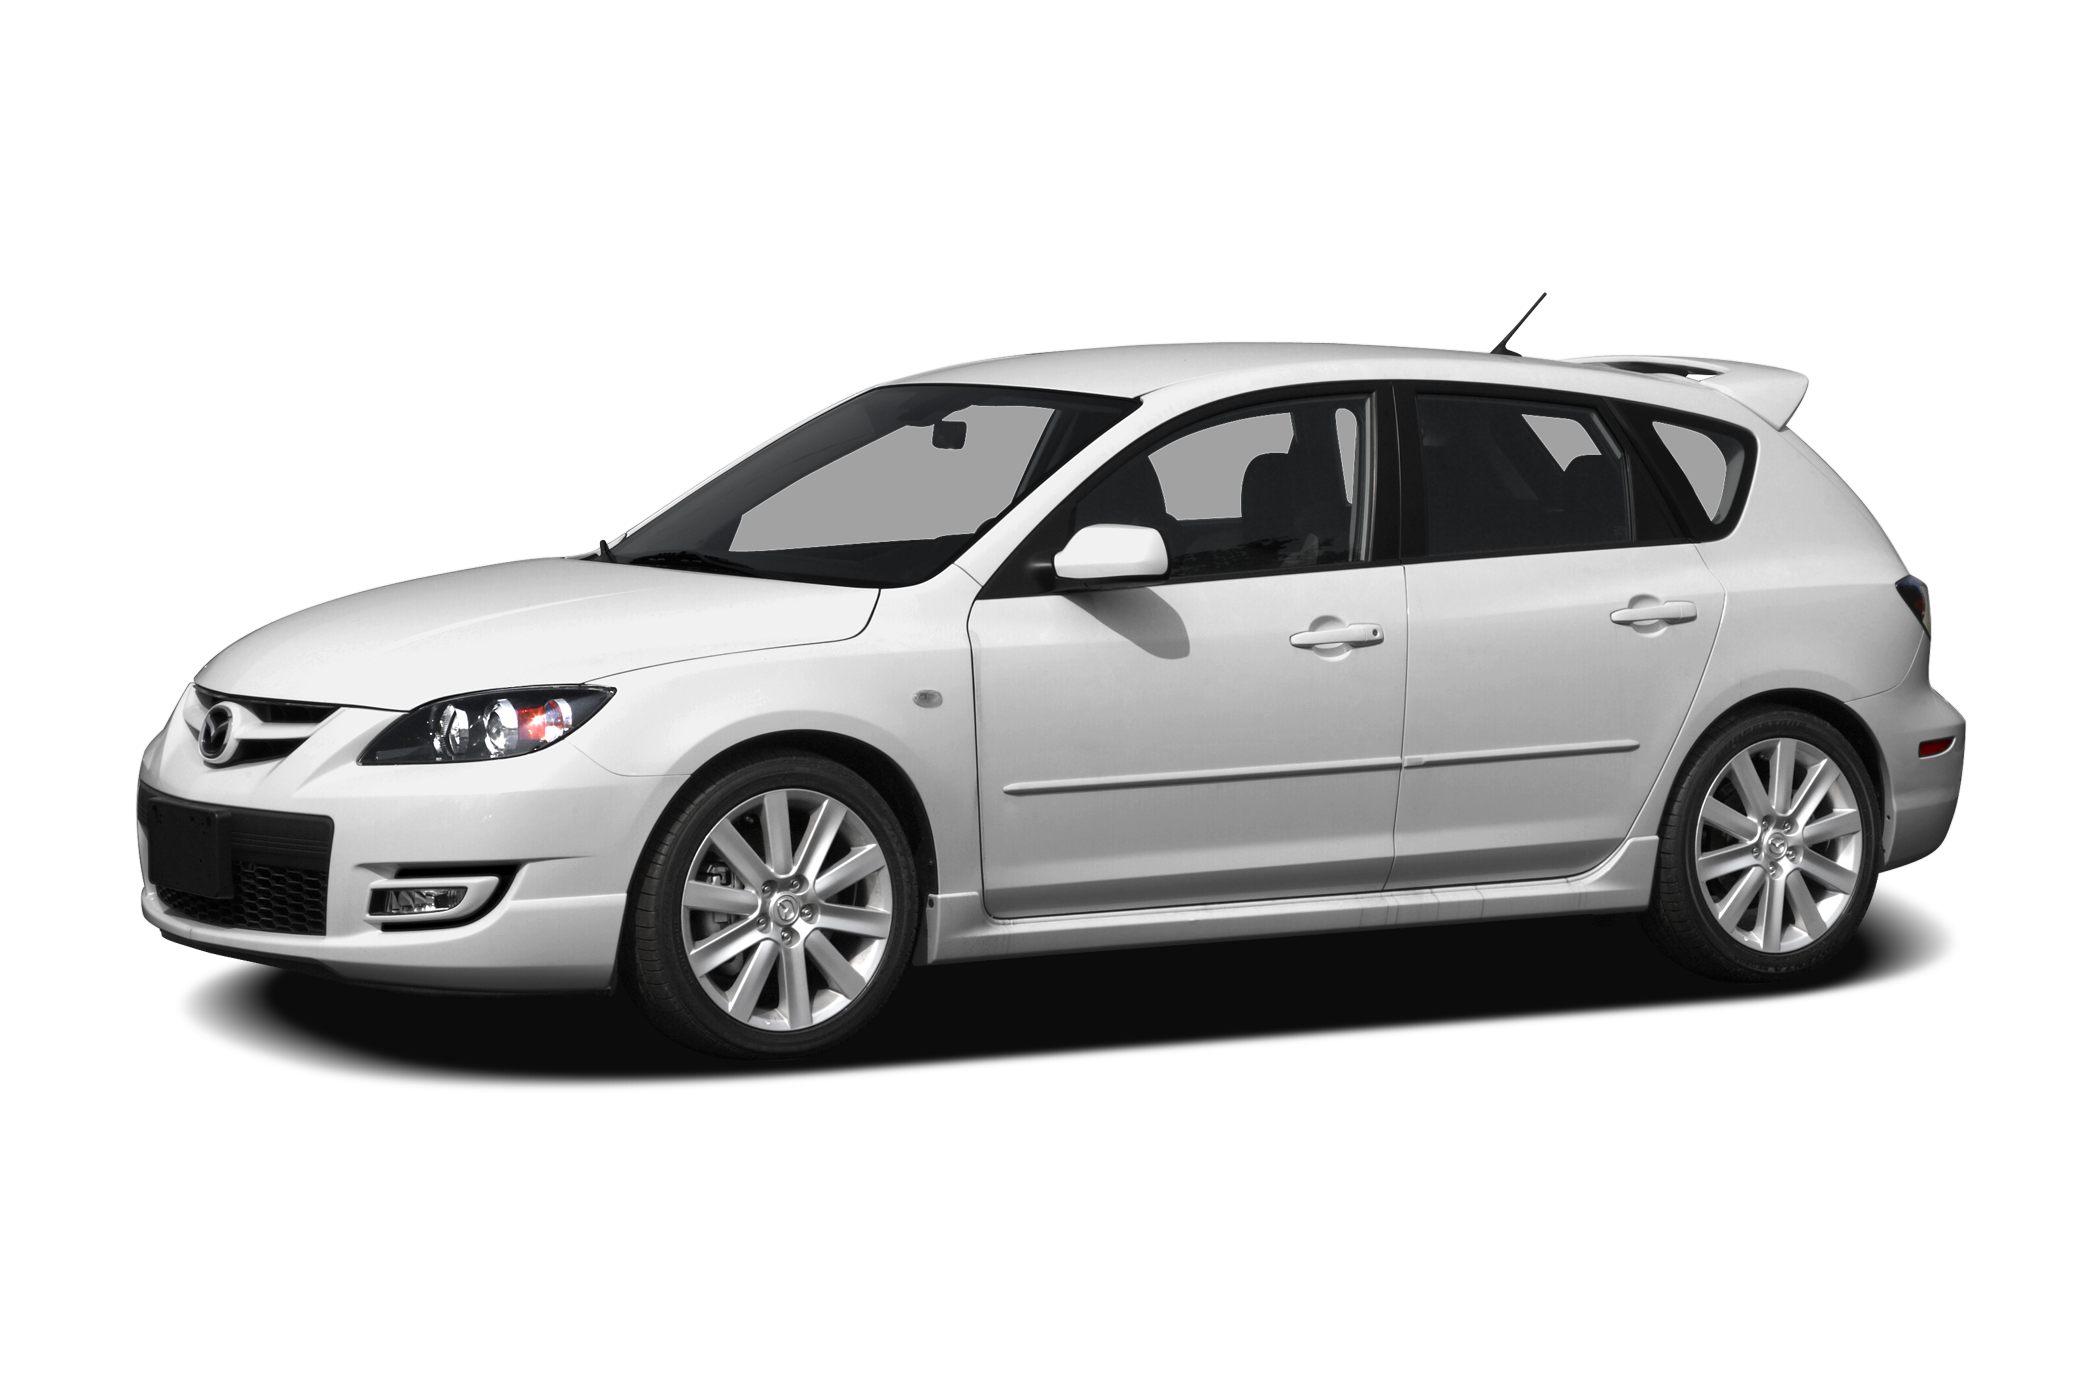 Mazda Speed 3 >> 2008 Mazda Mazdaspeed3 Sport 4dr Hatchback Specs And Prices